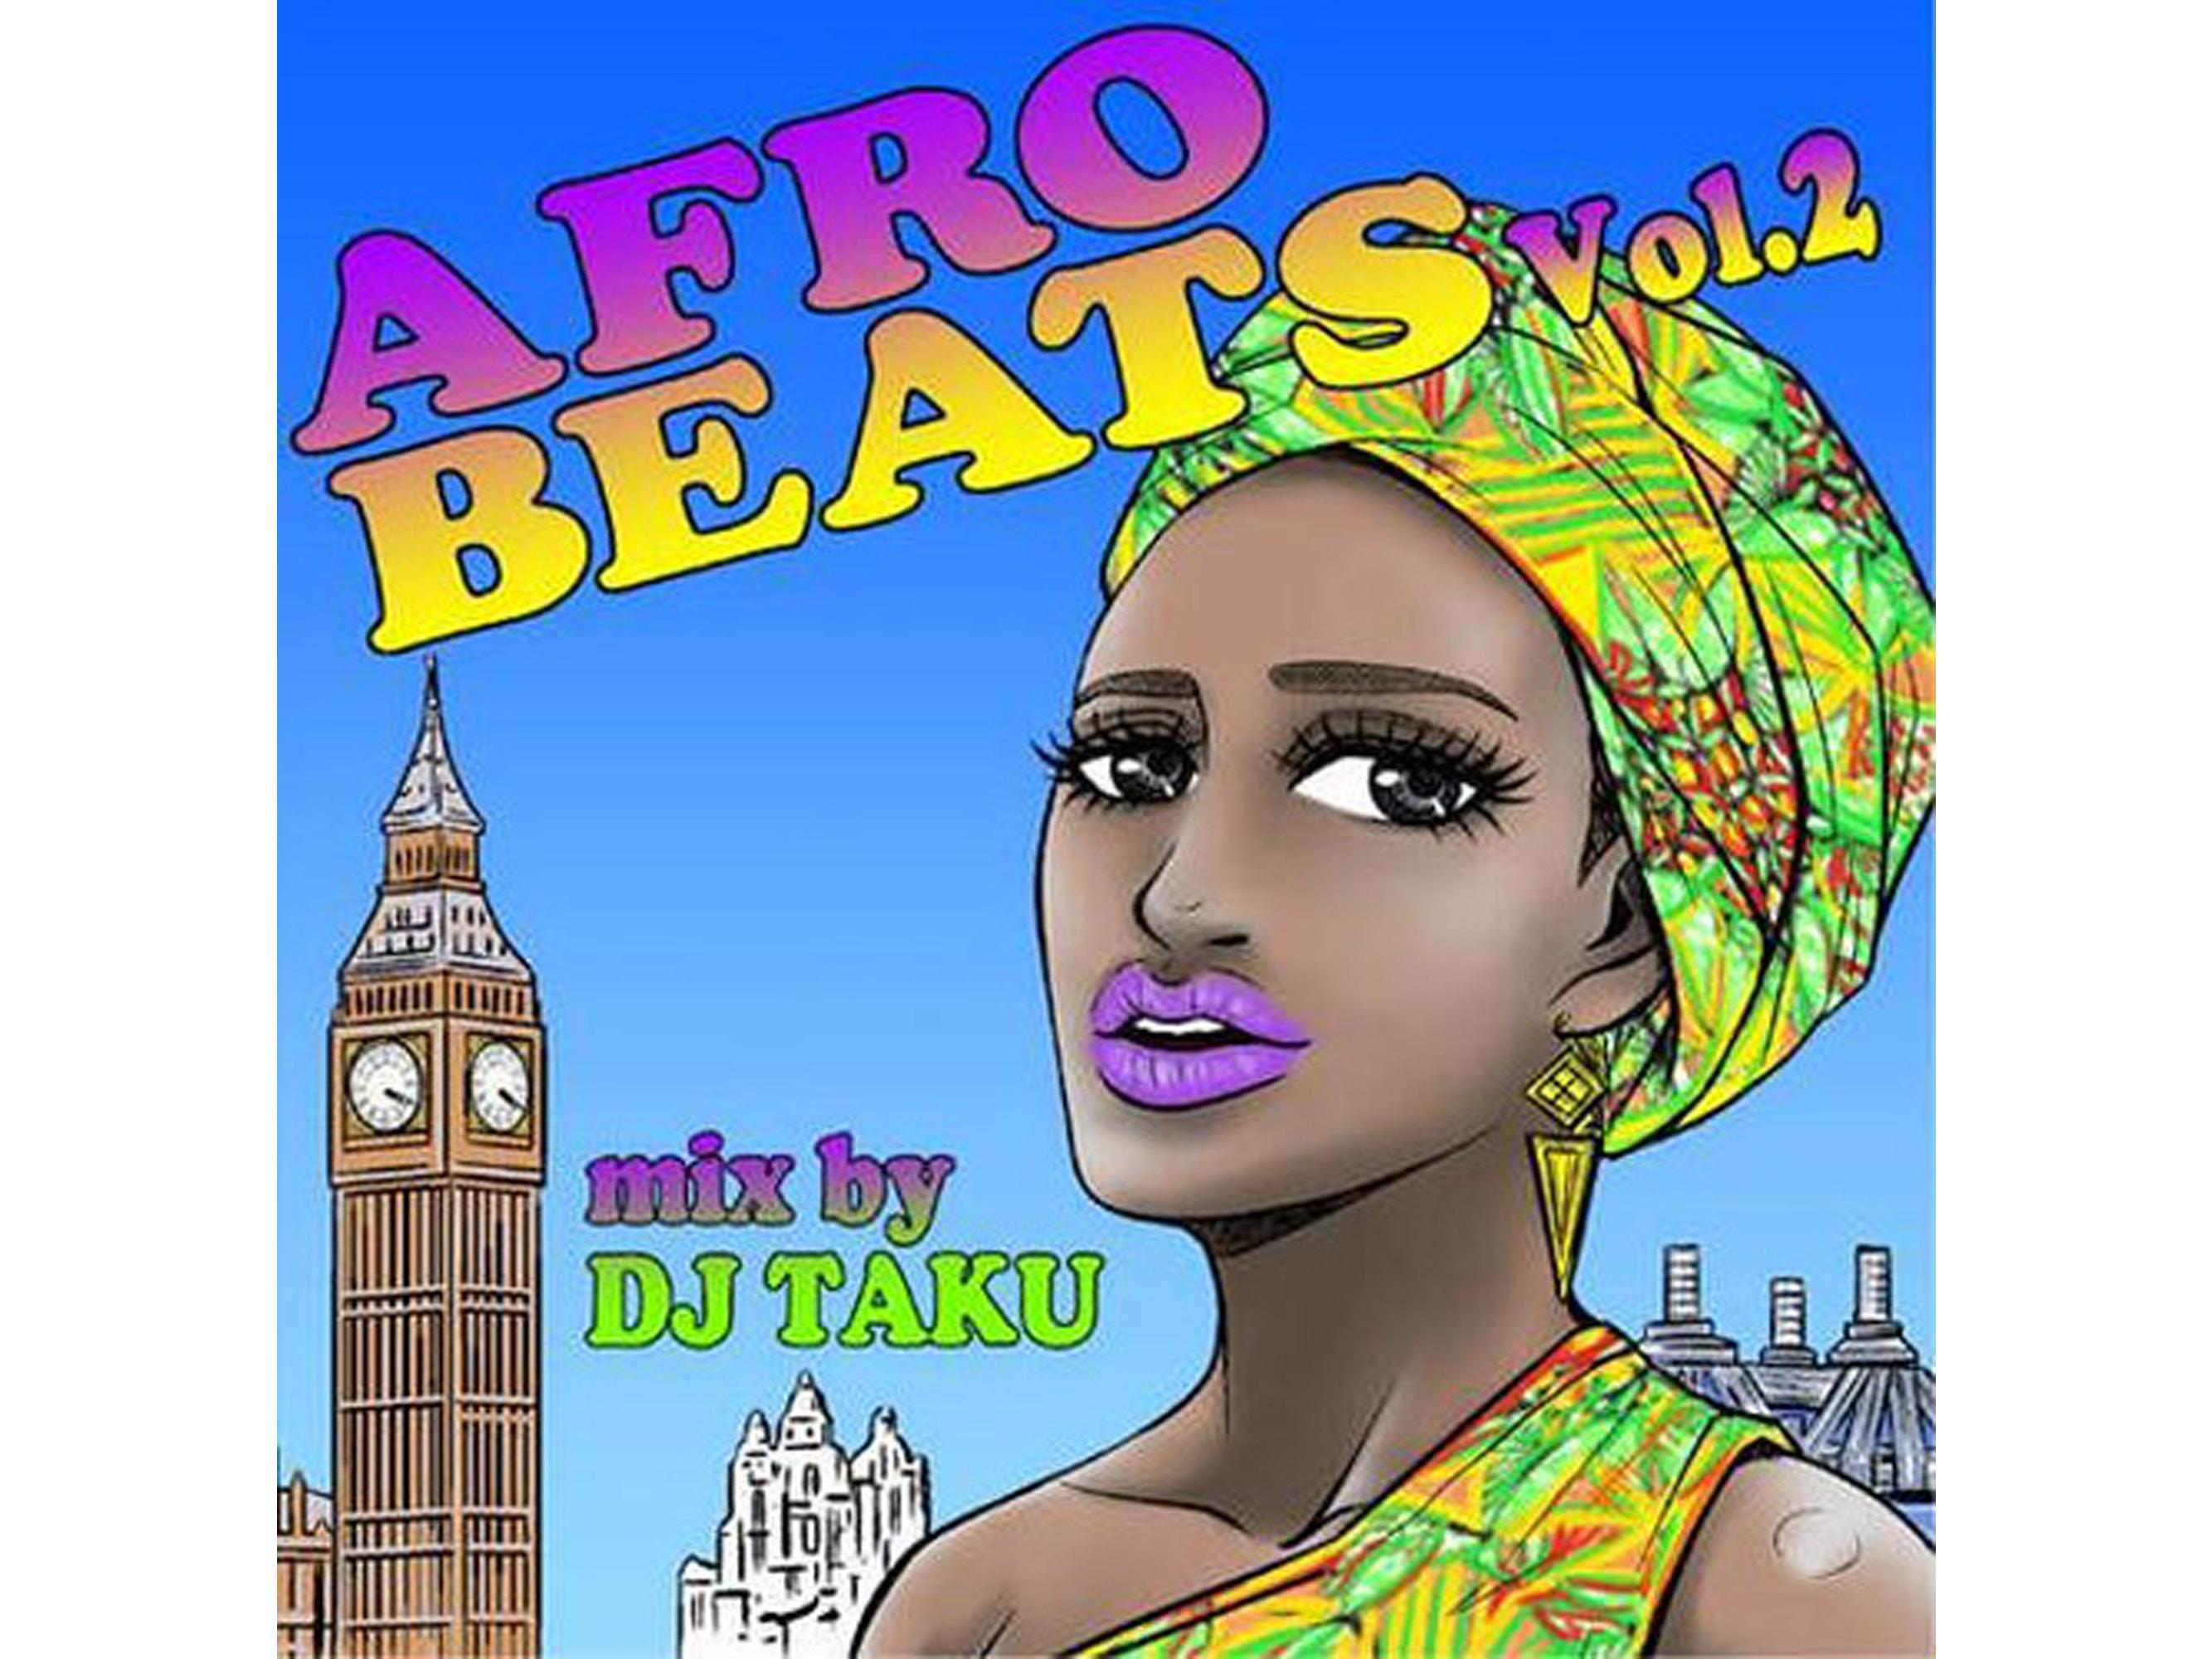 AFRO BEATS vol.2 -mix by DJ TAKU(EMPEROR)-